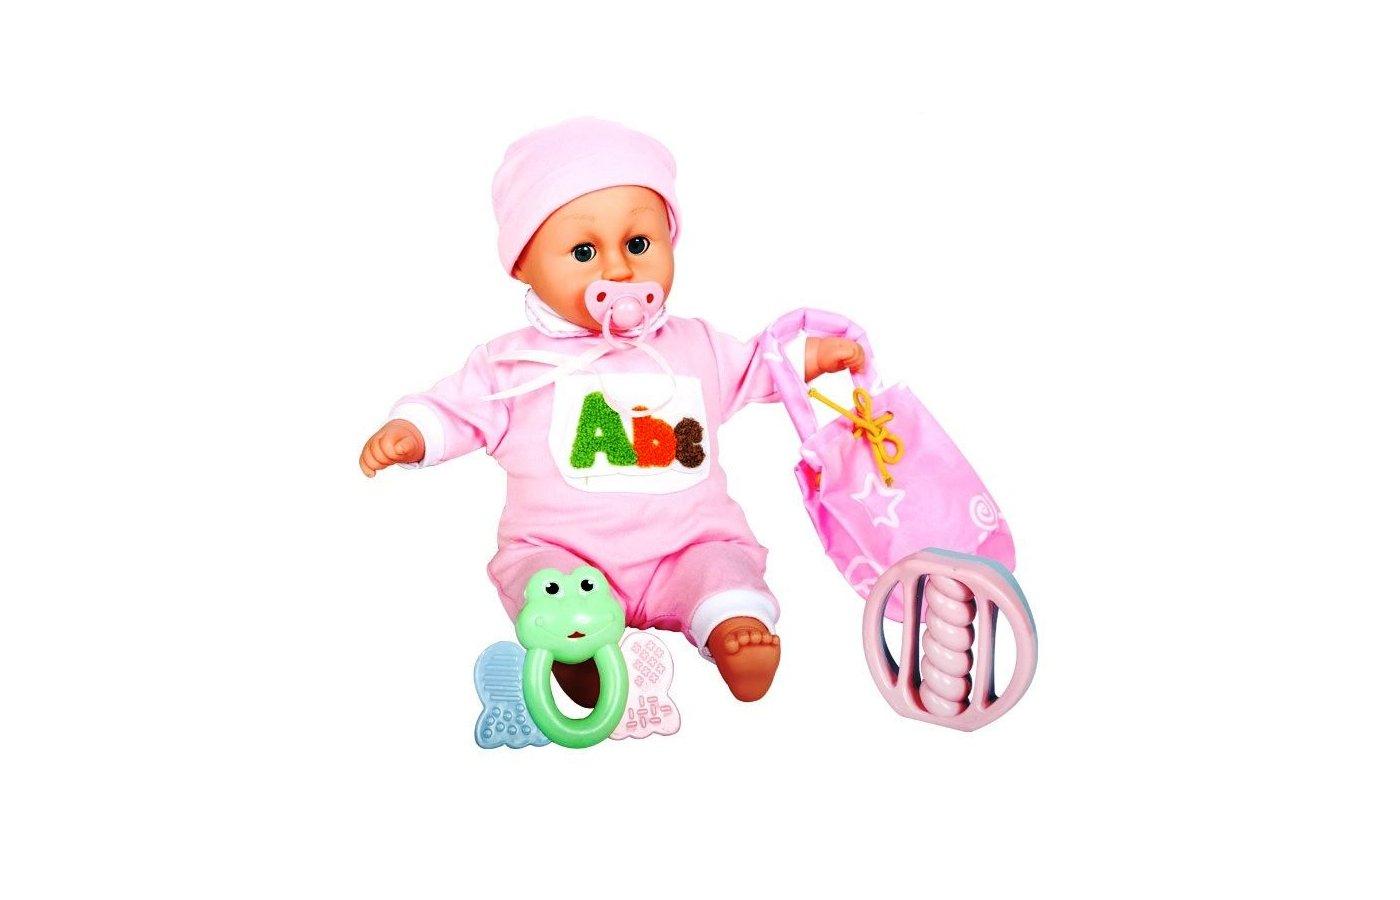 Игрушка DollyToy DOL0804-004 Интерактивная кукла-младенец Моя малышка